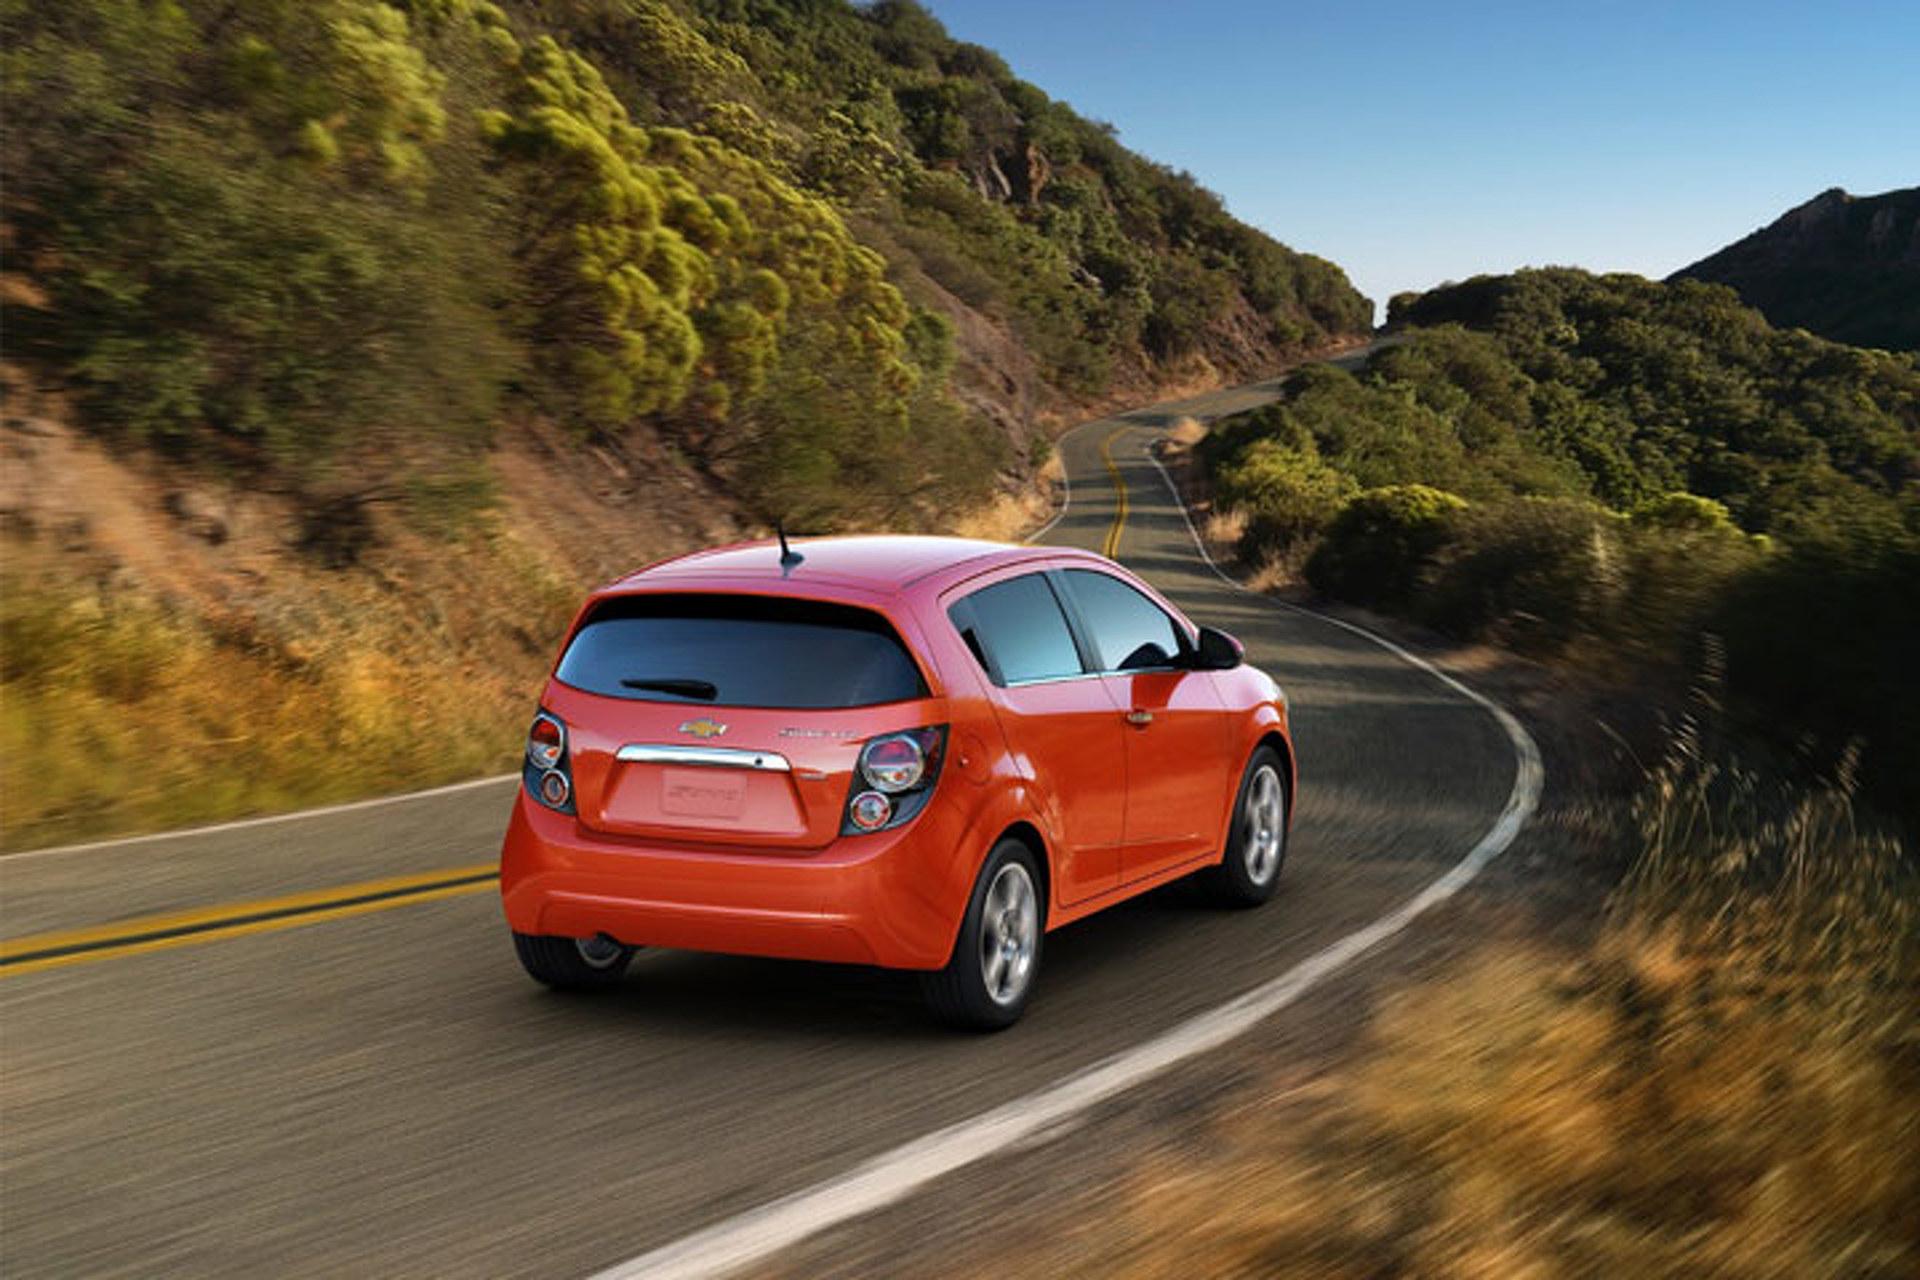 Is the Sonic EV GM's Response to the Tesla Model III?